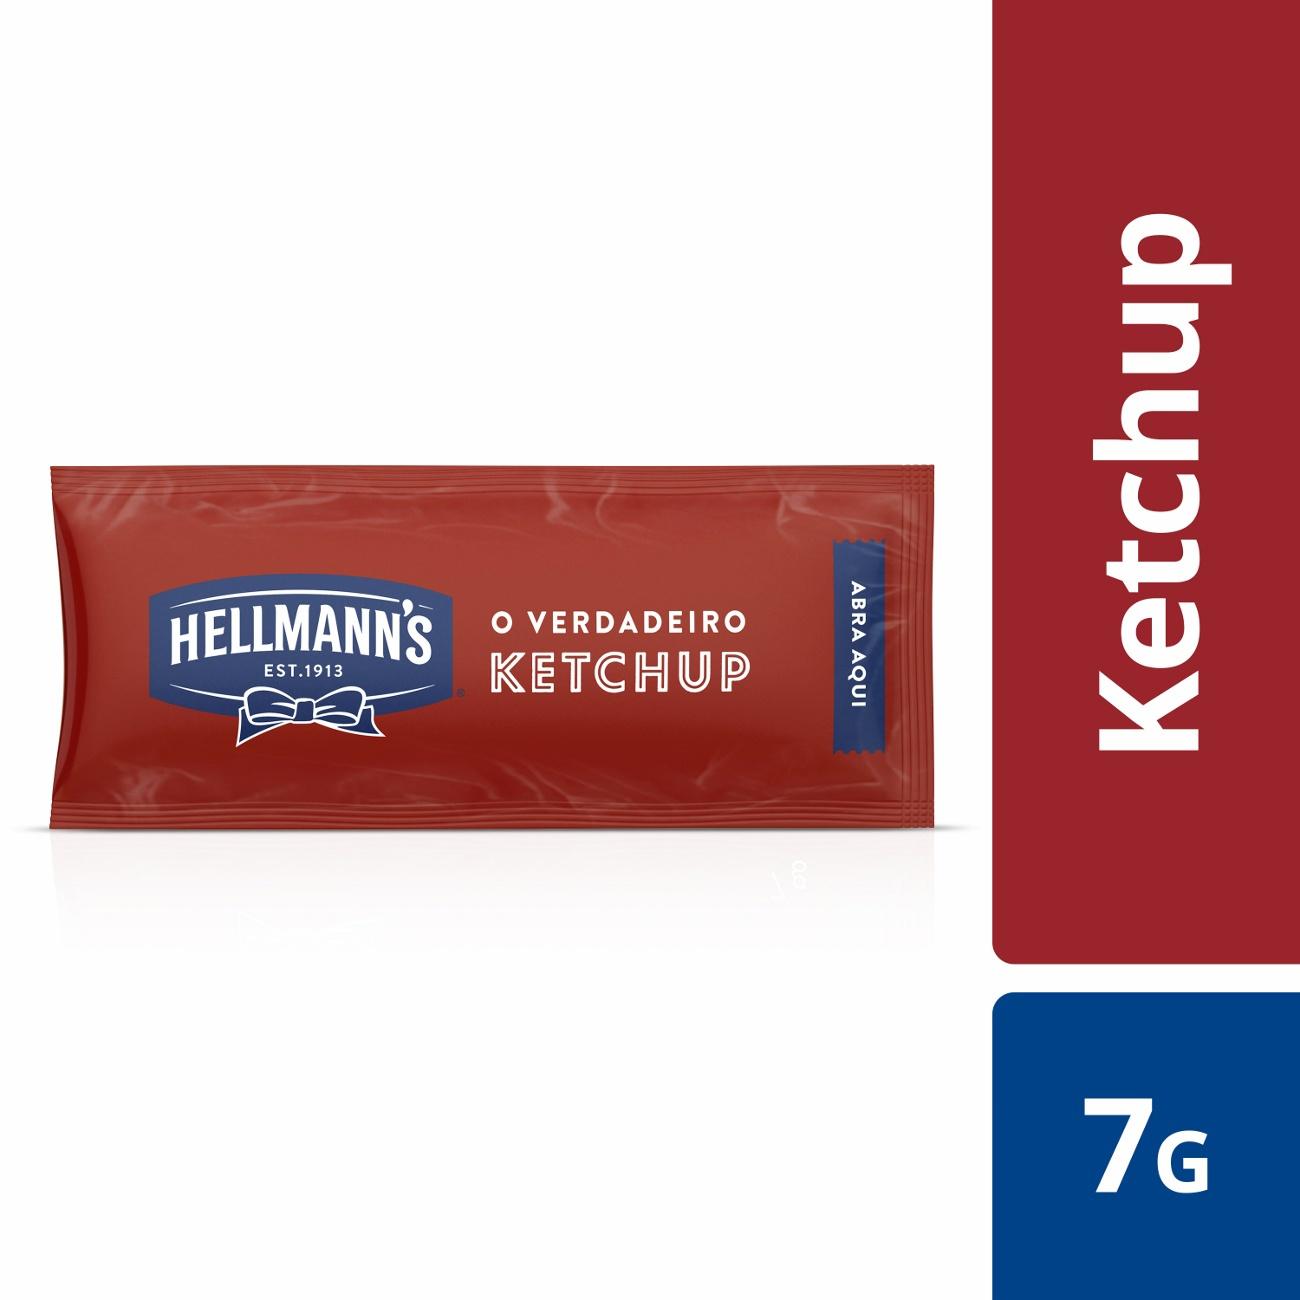 Ketchup Hellmann's Sache 7g |168 unidades